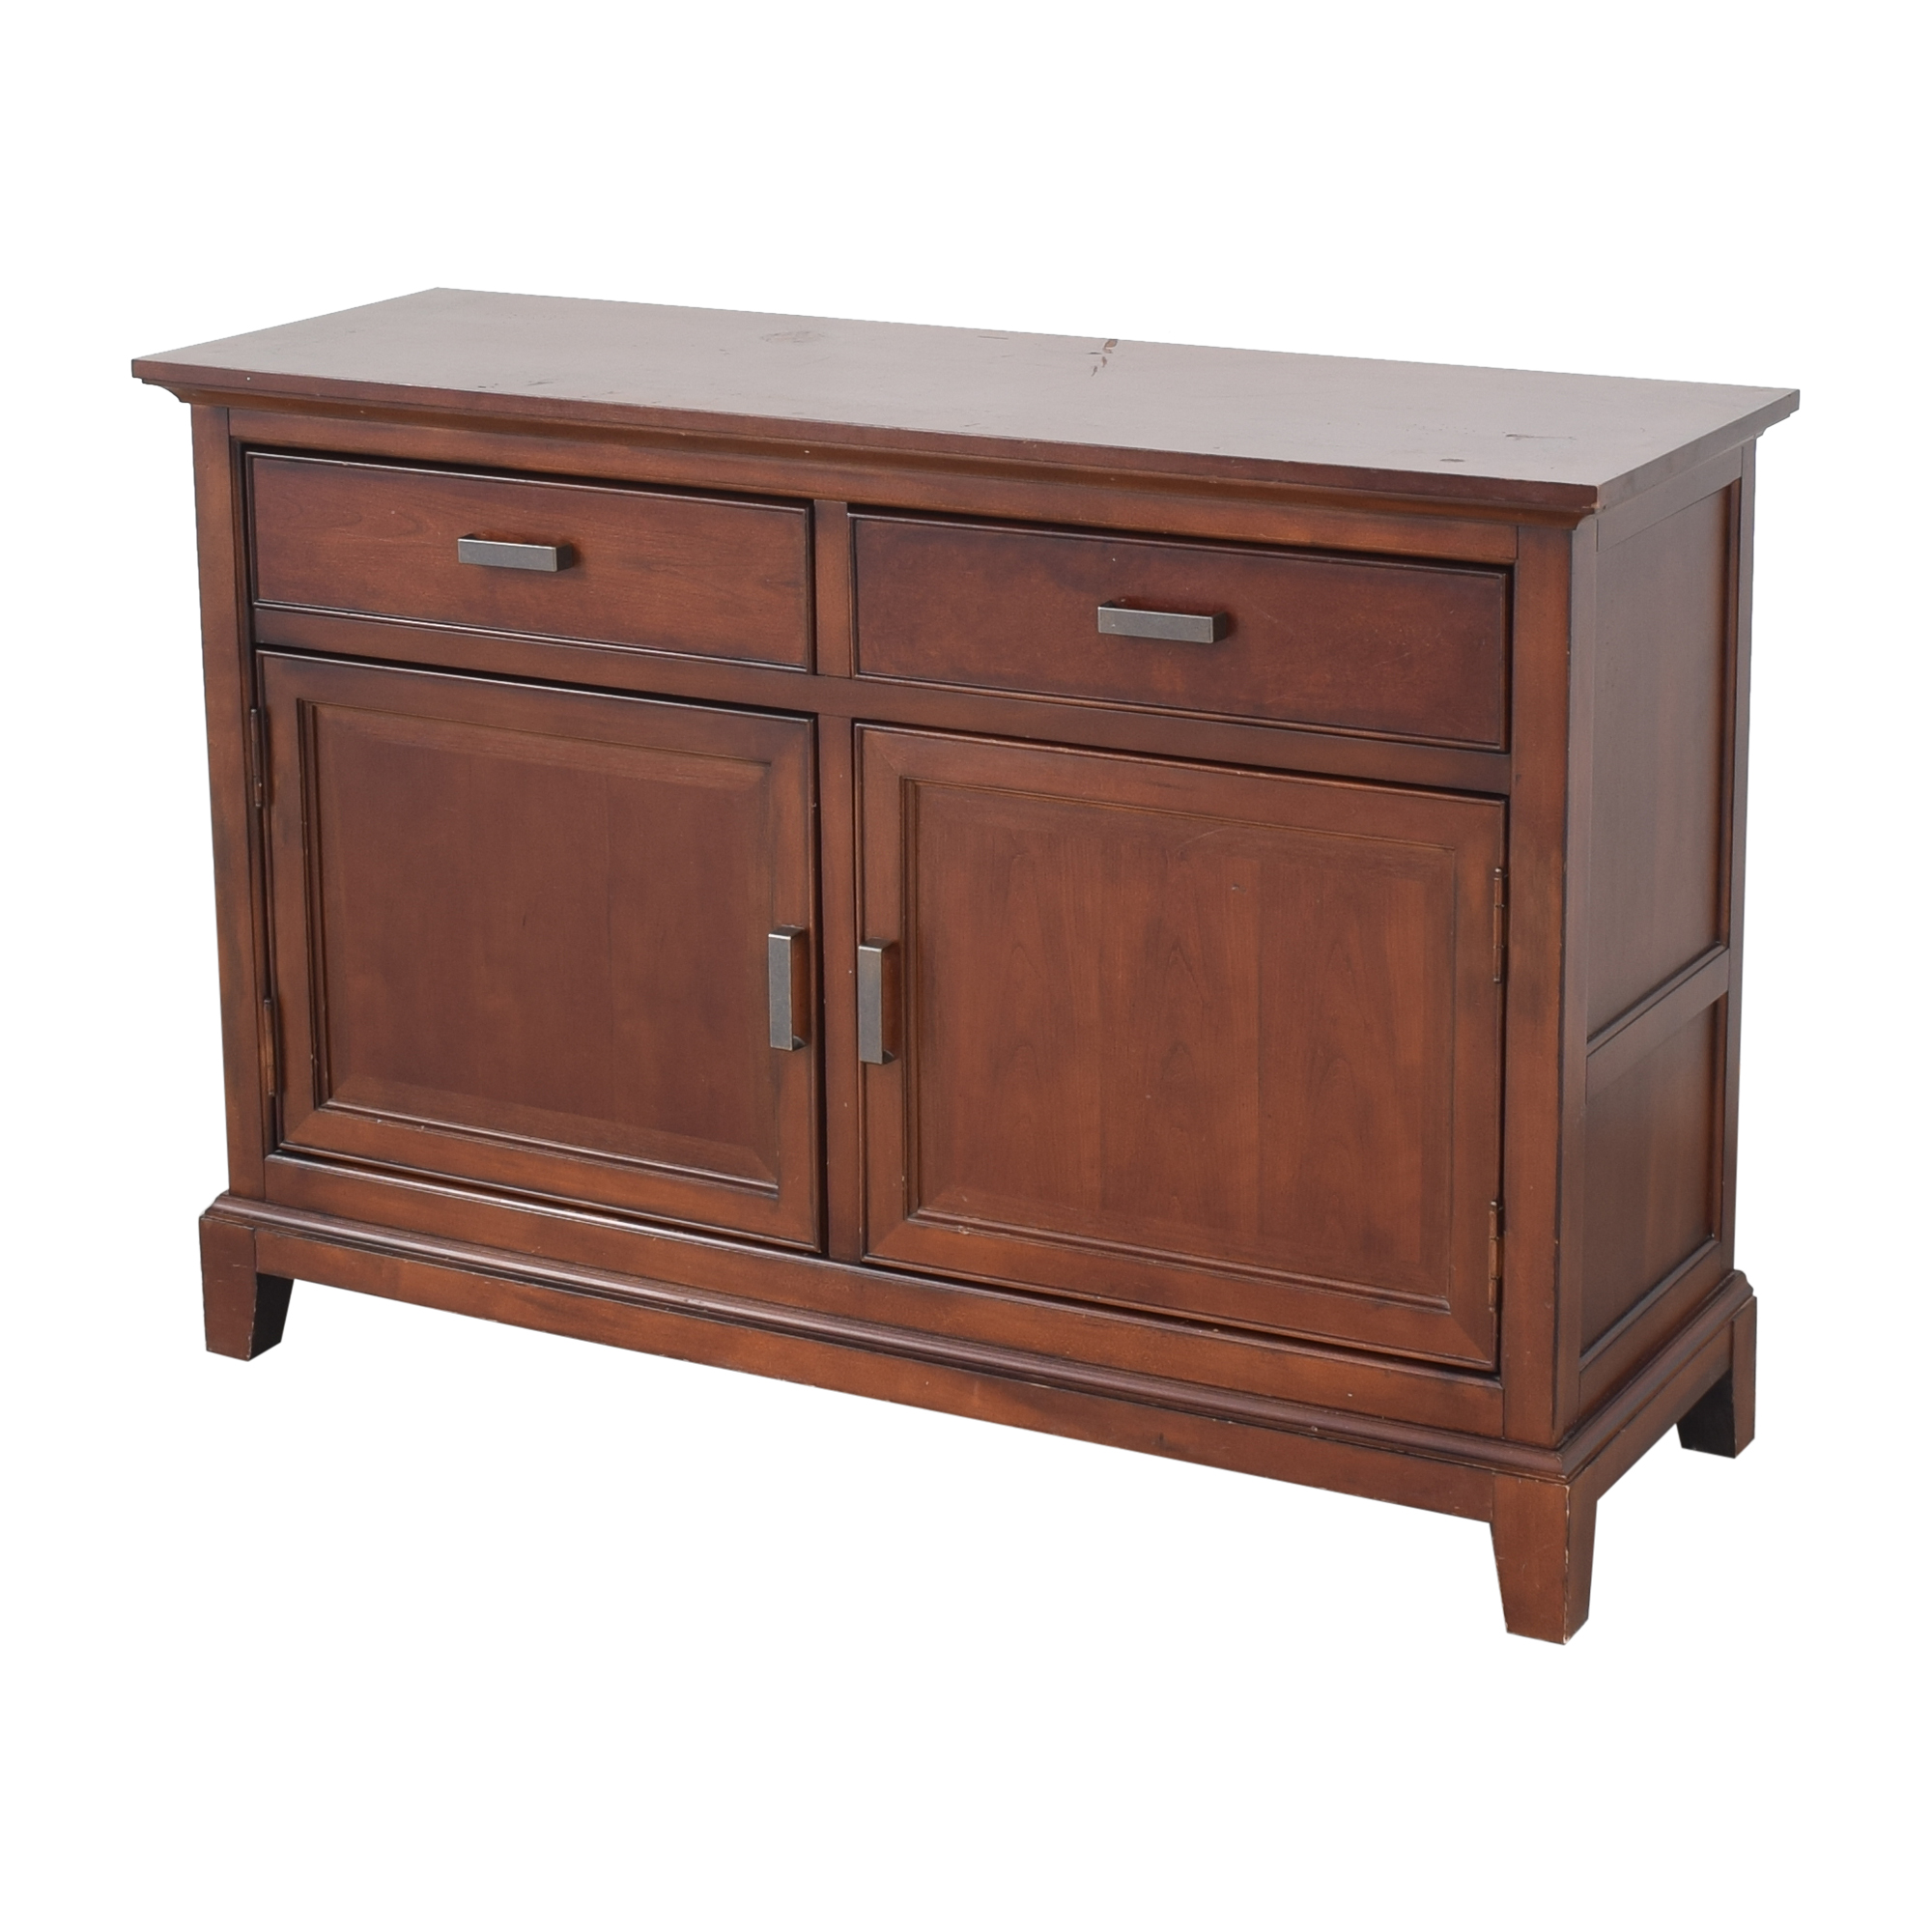 Legacy Classic Furniture Legacy Classic Buffet Cabinet ct